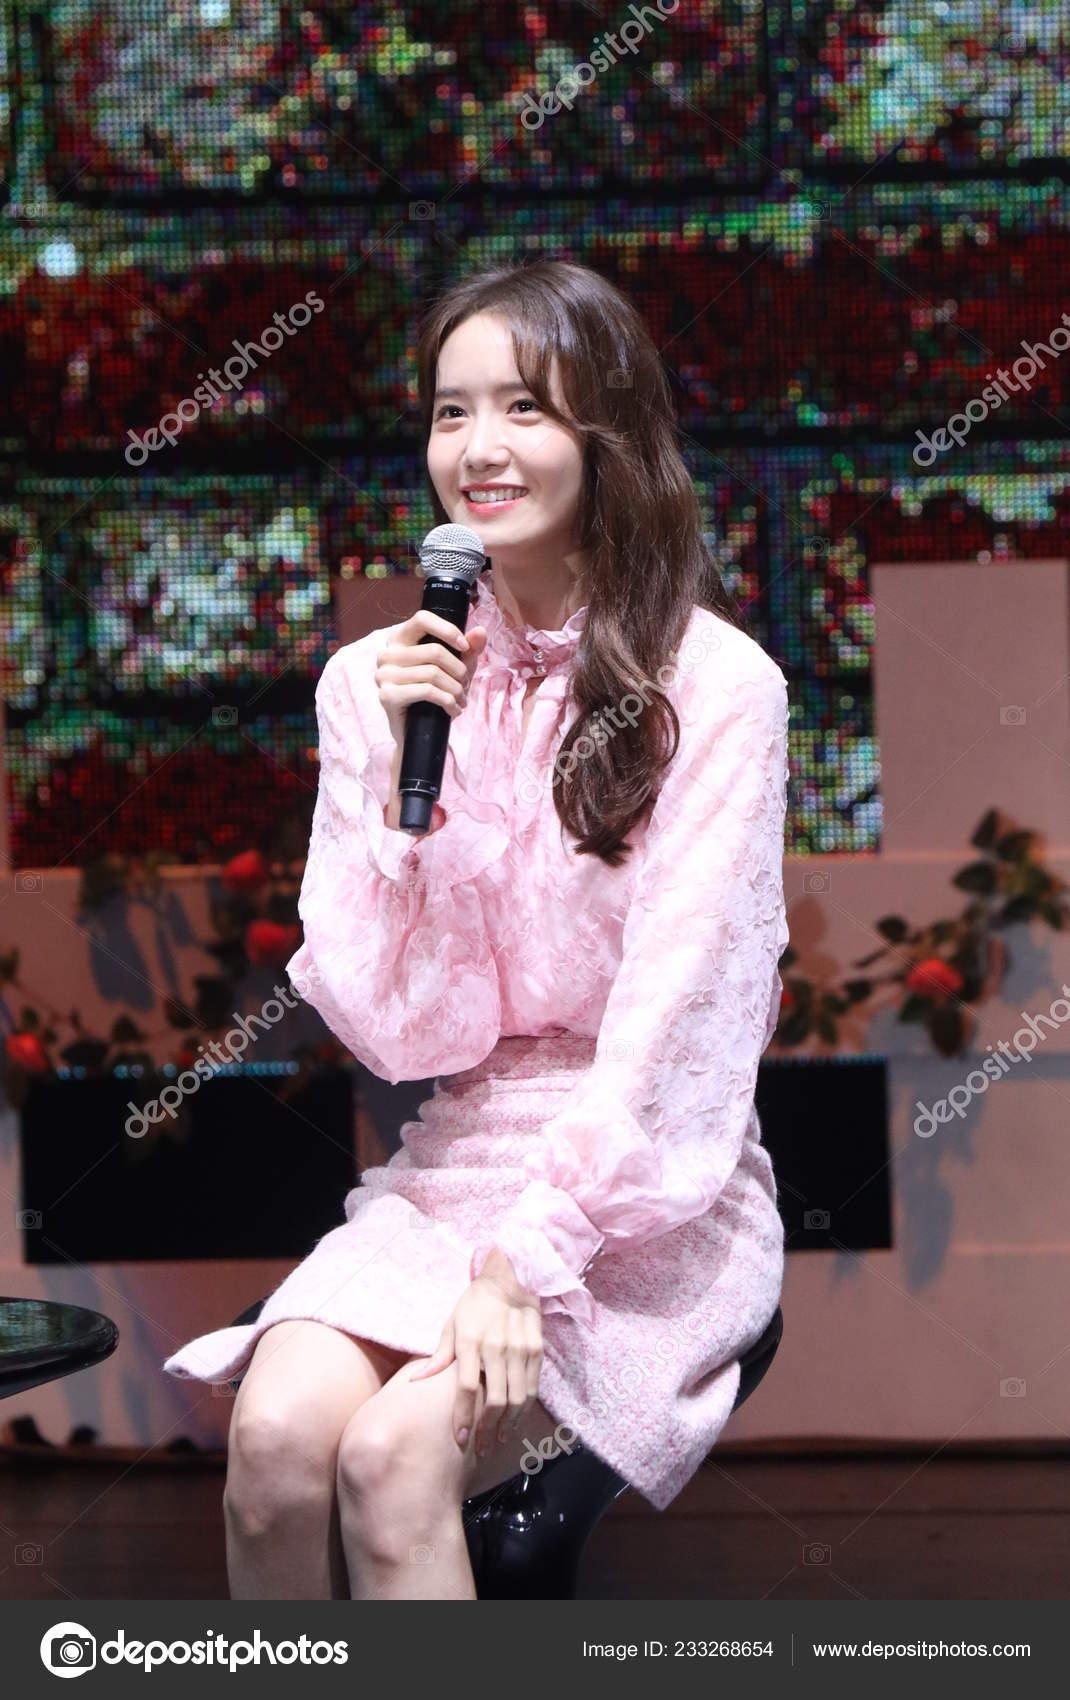 Park Ji sunget dating YoonA dating sites gratis Canada